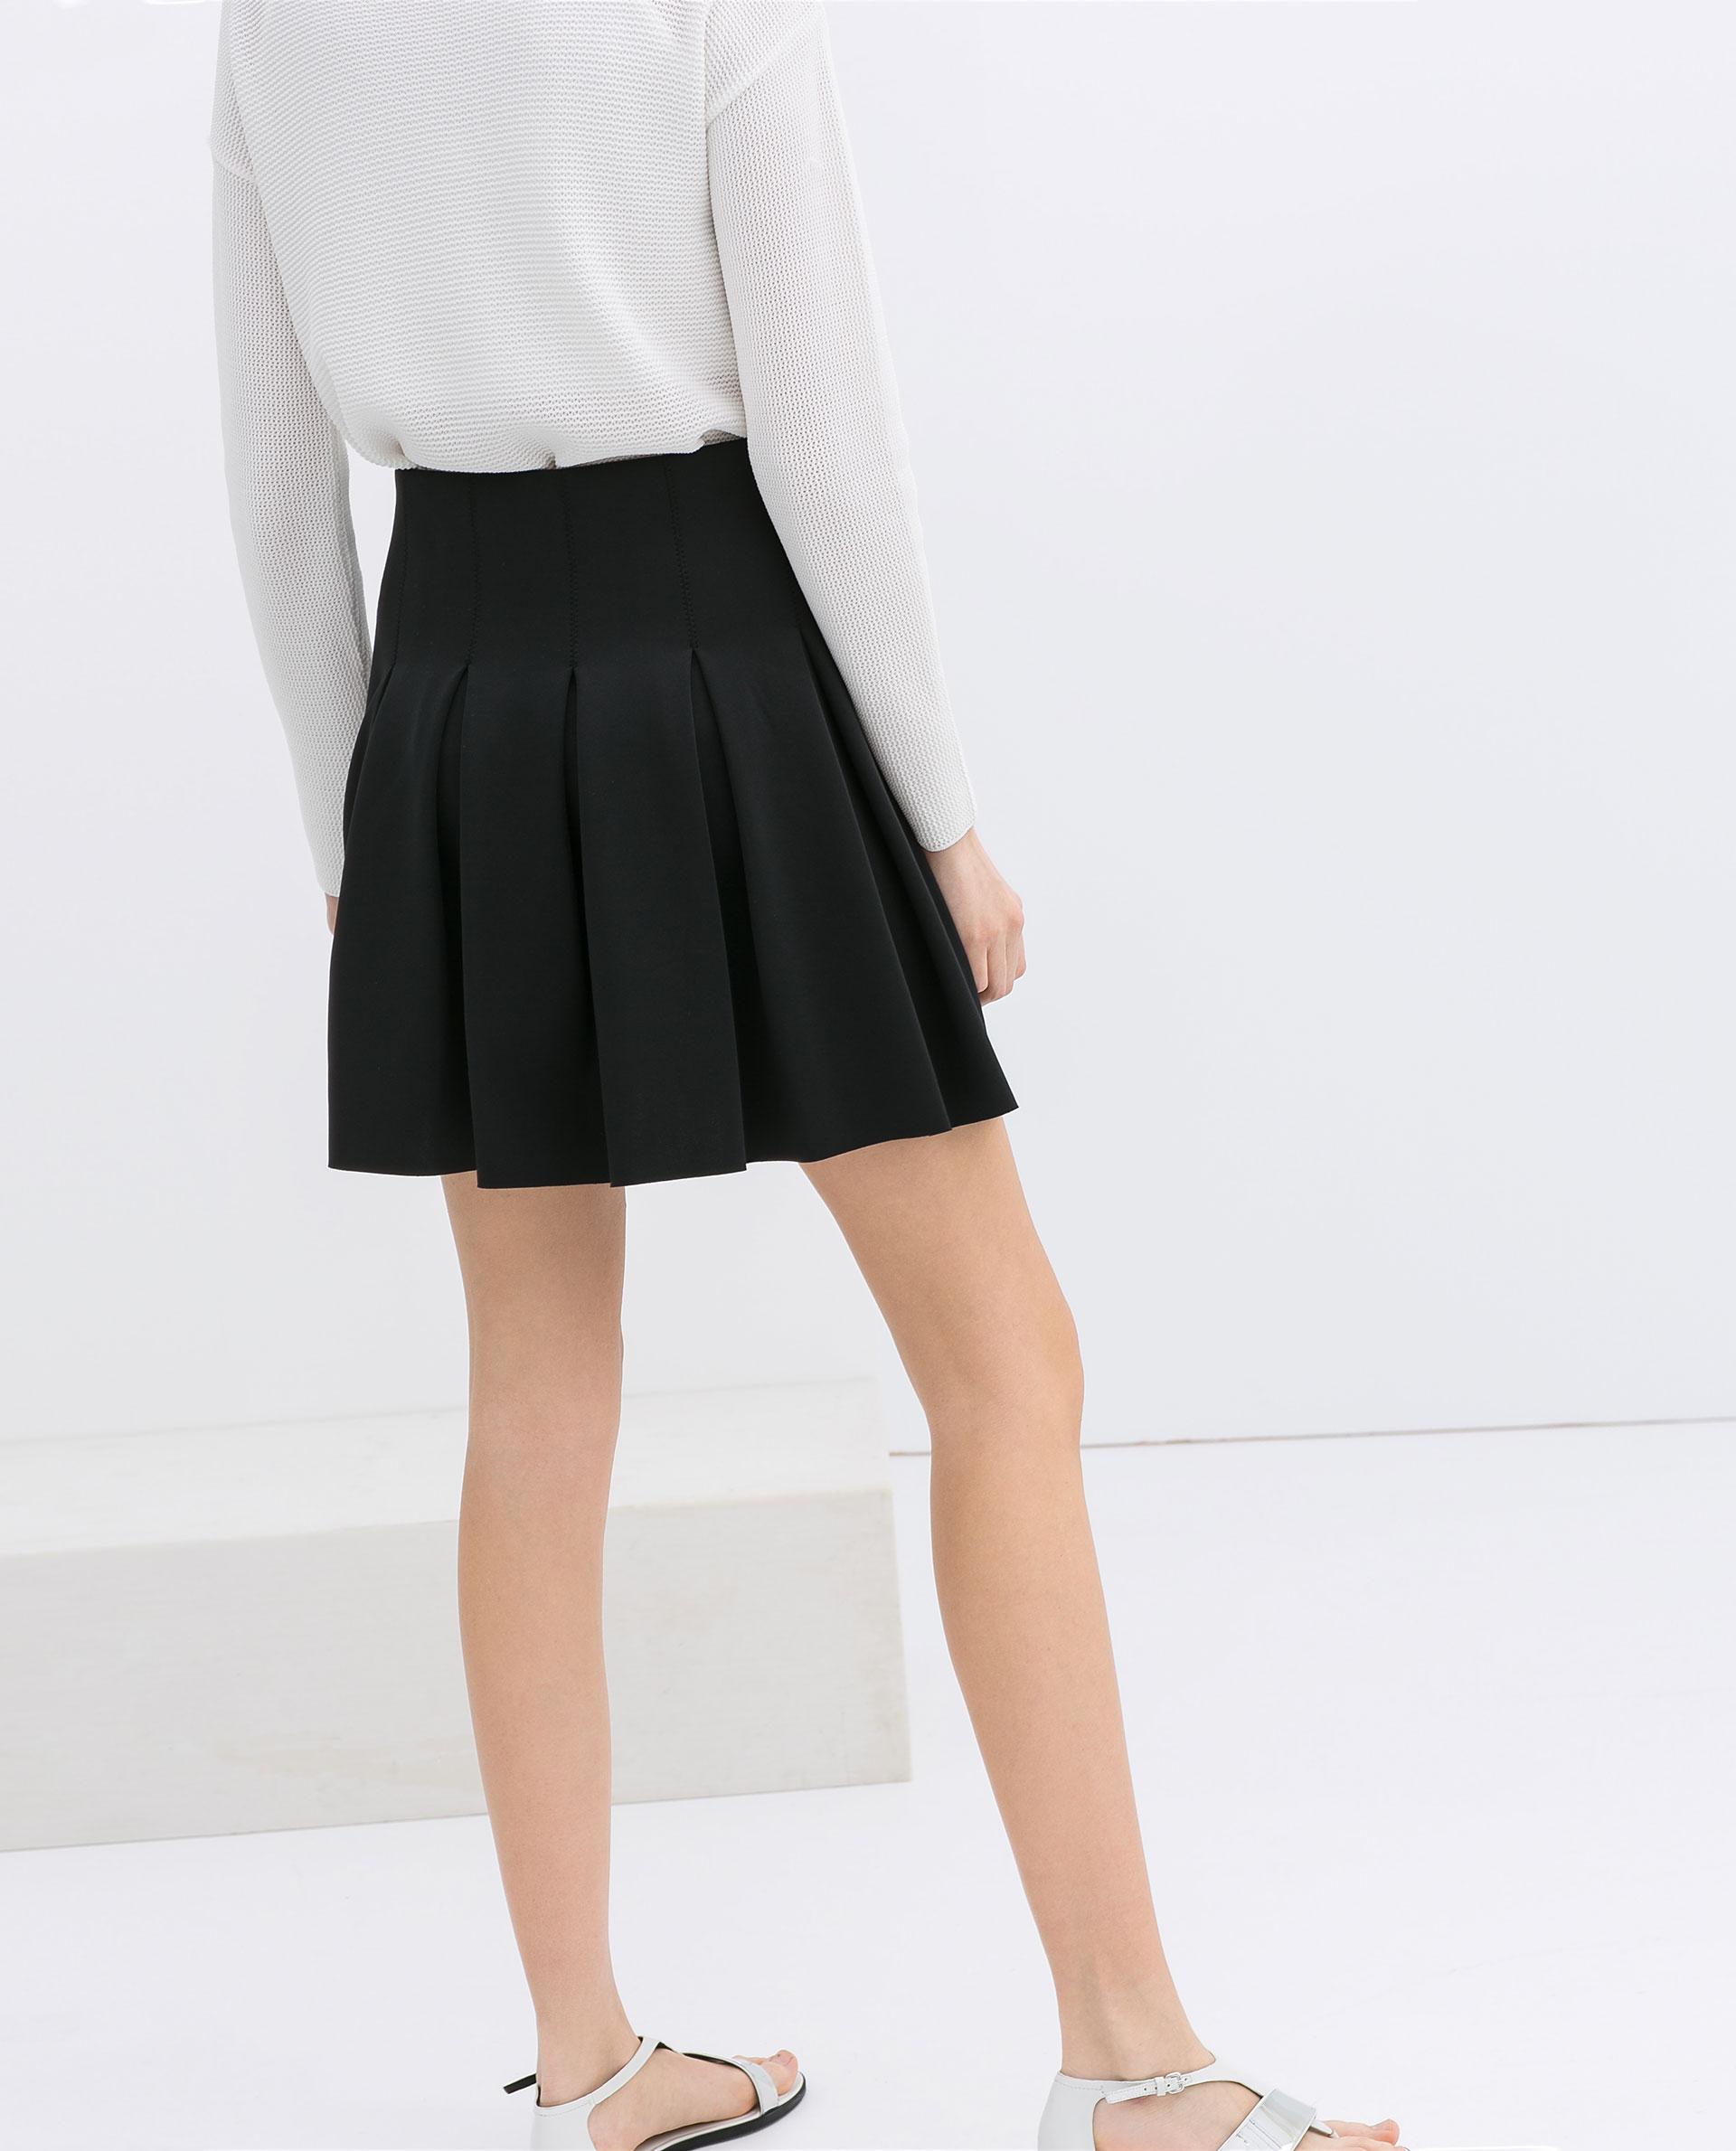 Black pleated school skirt fashion 47